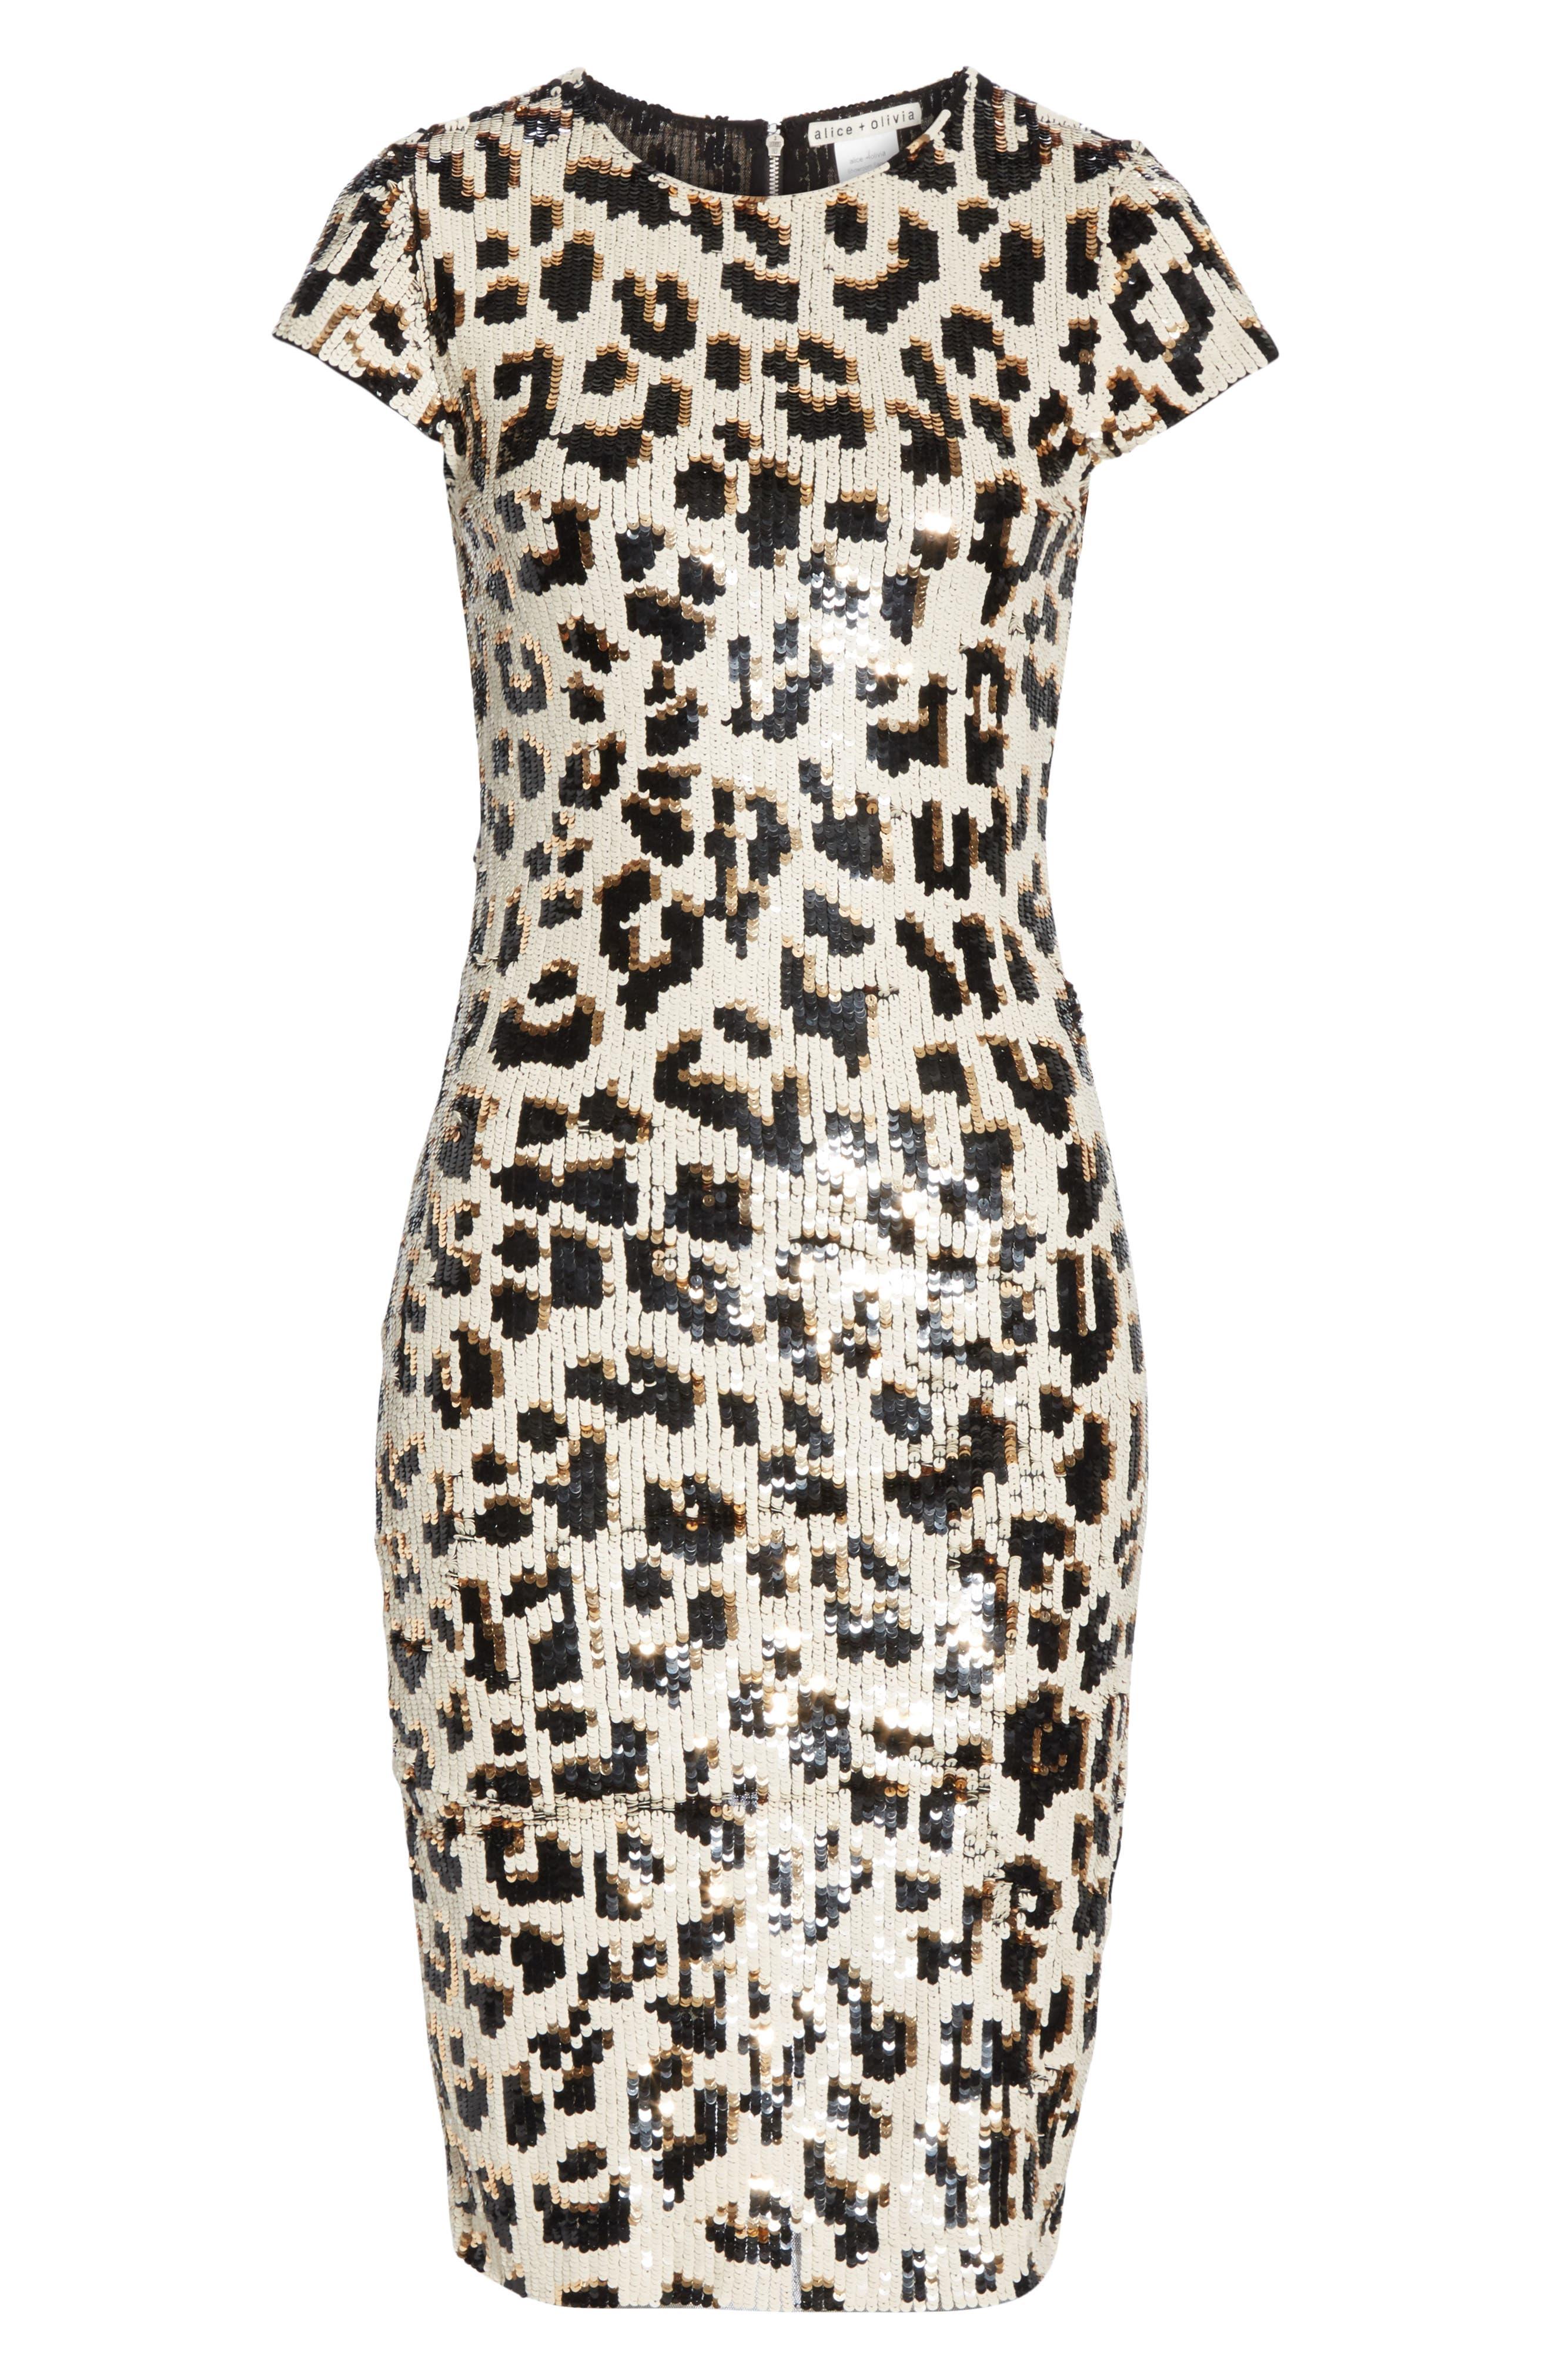 ALICE + OLIVIA,                             Nat Sequin Sheath Dress,                             Alternate thumbnail 7, color,                             LEOPARD